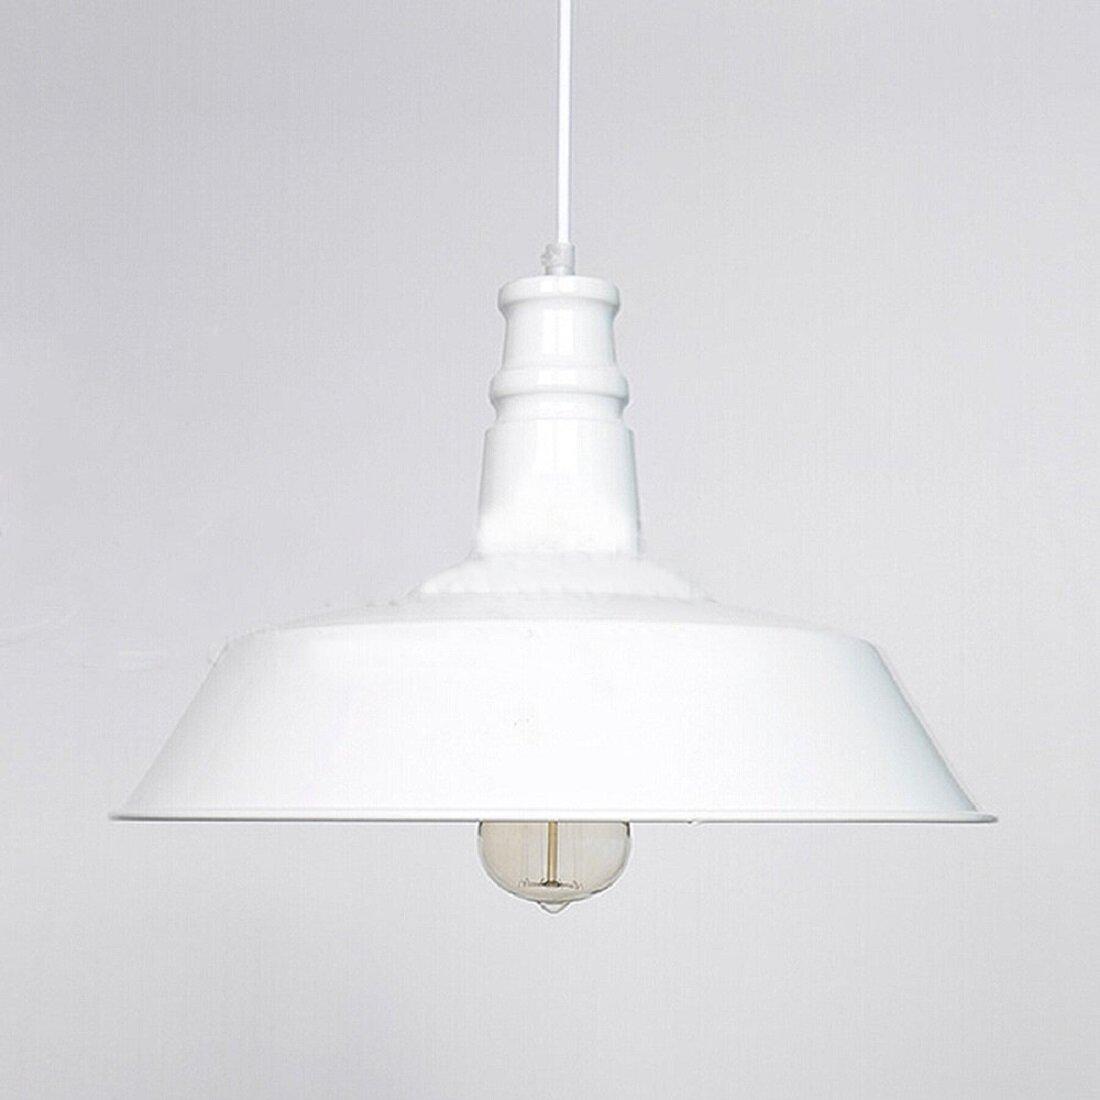 Gracie Oaks Futrell 1 Light Single Dome Pendant Reviews Wayfair